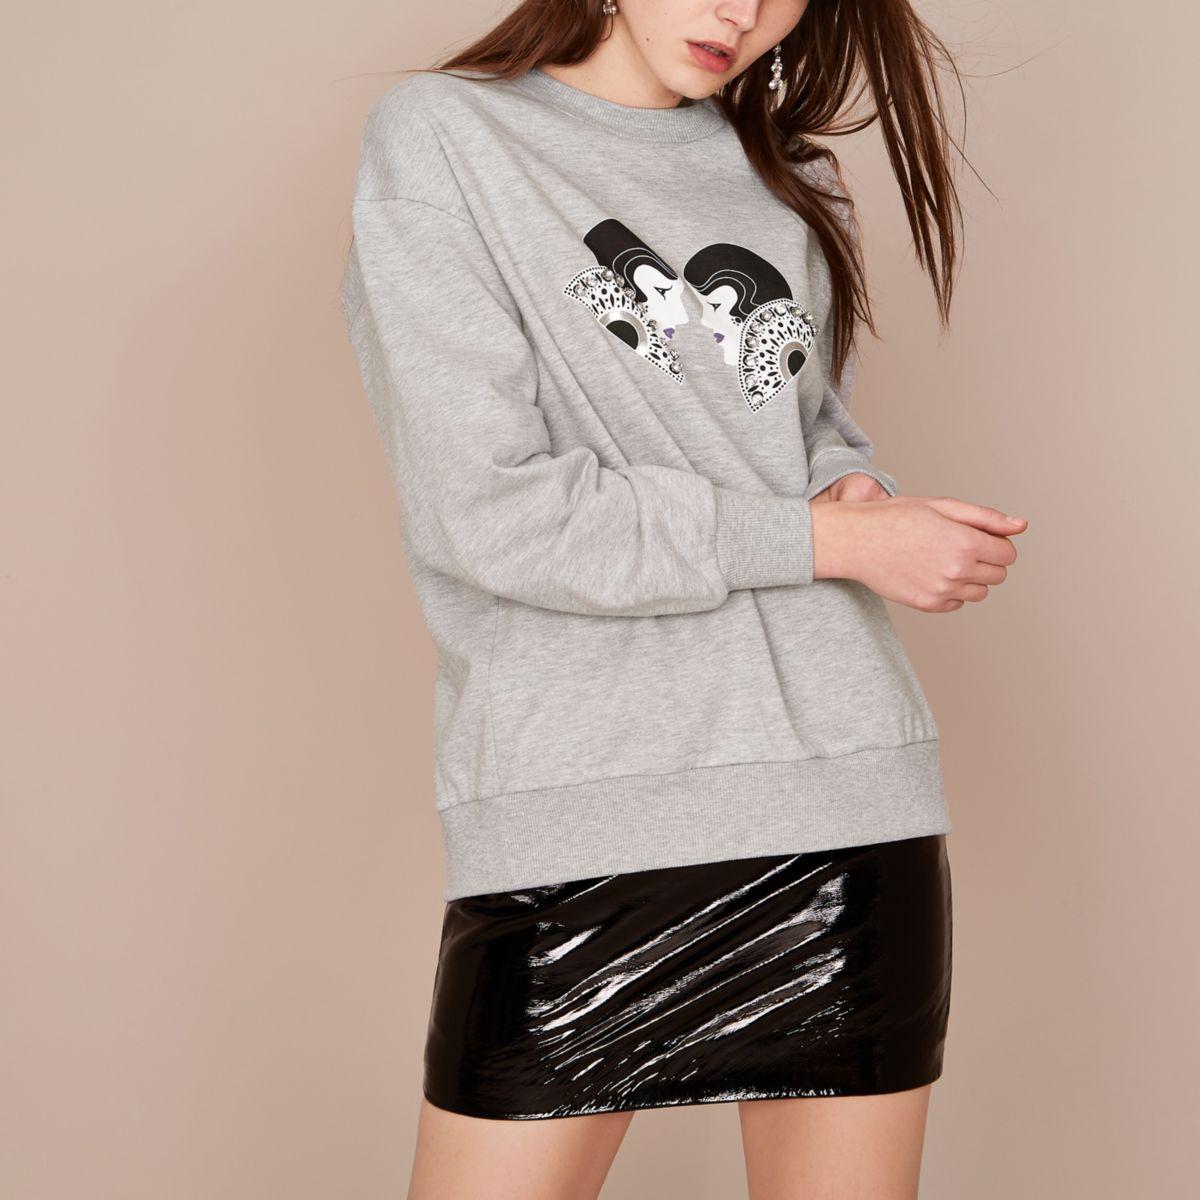 Holly Fulton - Grijs versierd sweatshirt